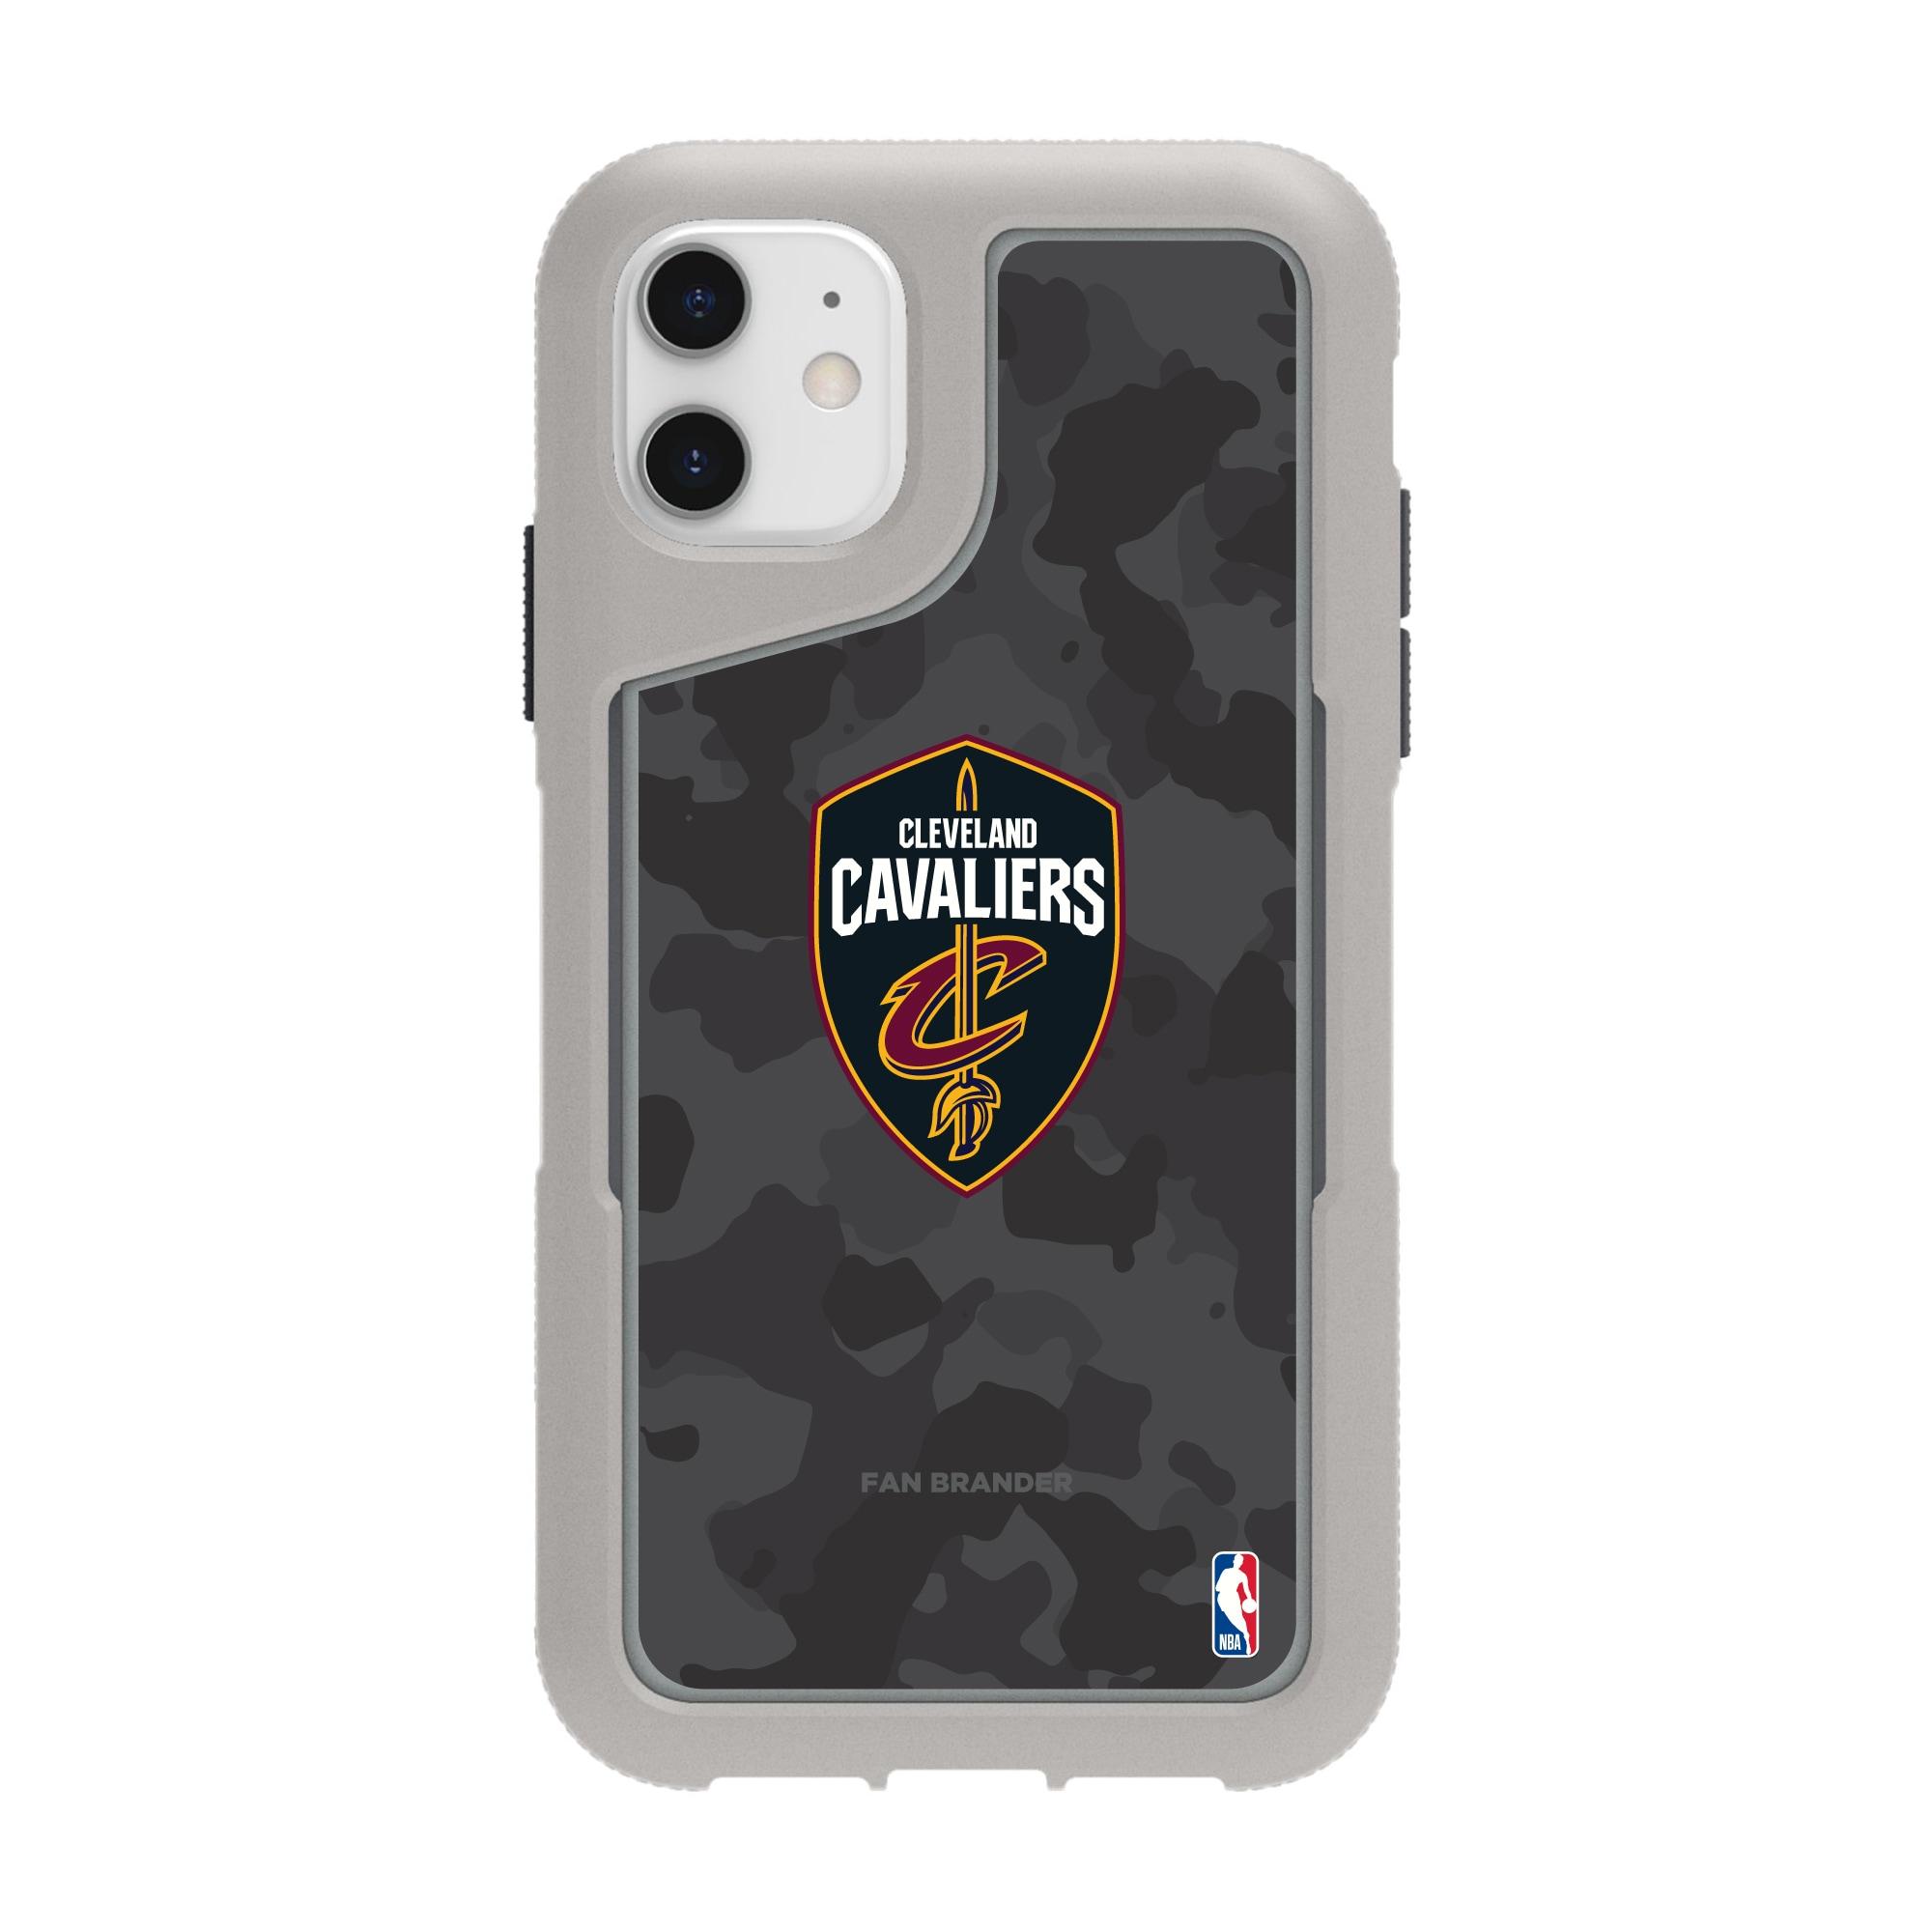 Cleveland Cavaliers Griffin Survivor Endurance Camo iPhone Case - Gray